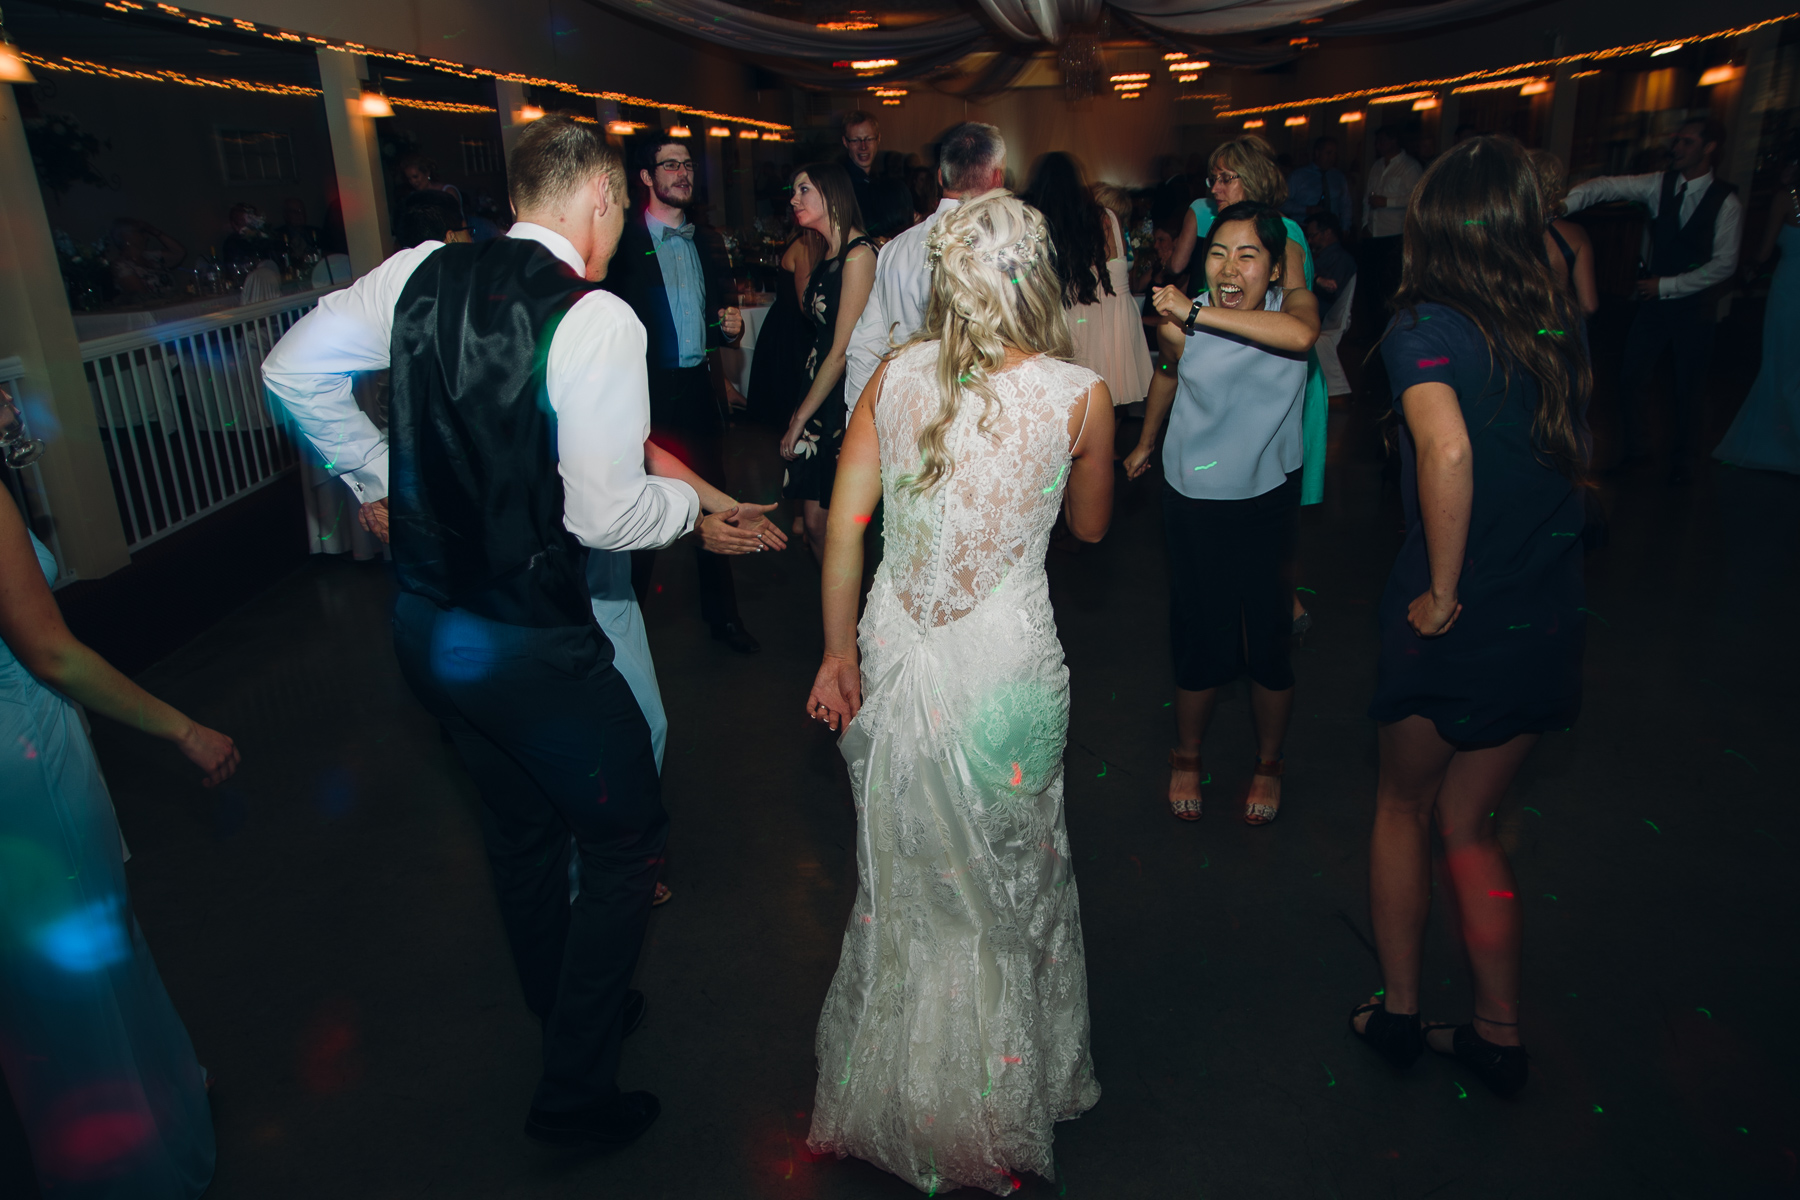 Kingston Wedding_Alabaster Jar Photography (41 of 42).jpg